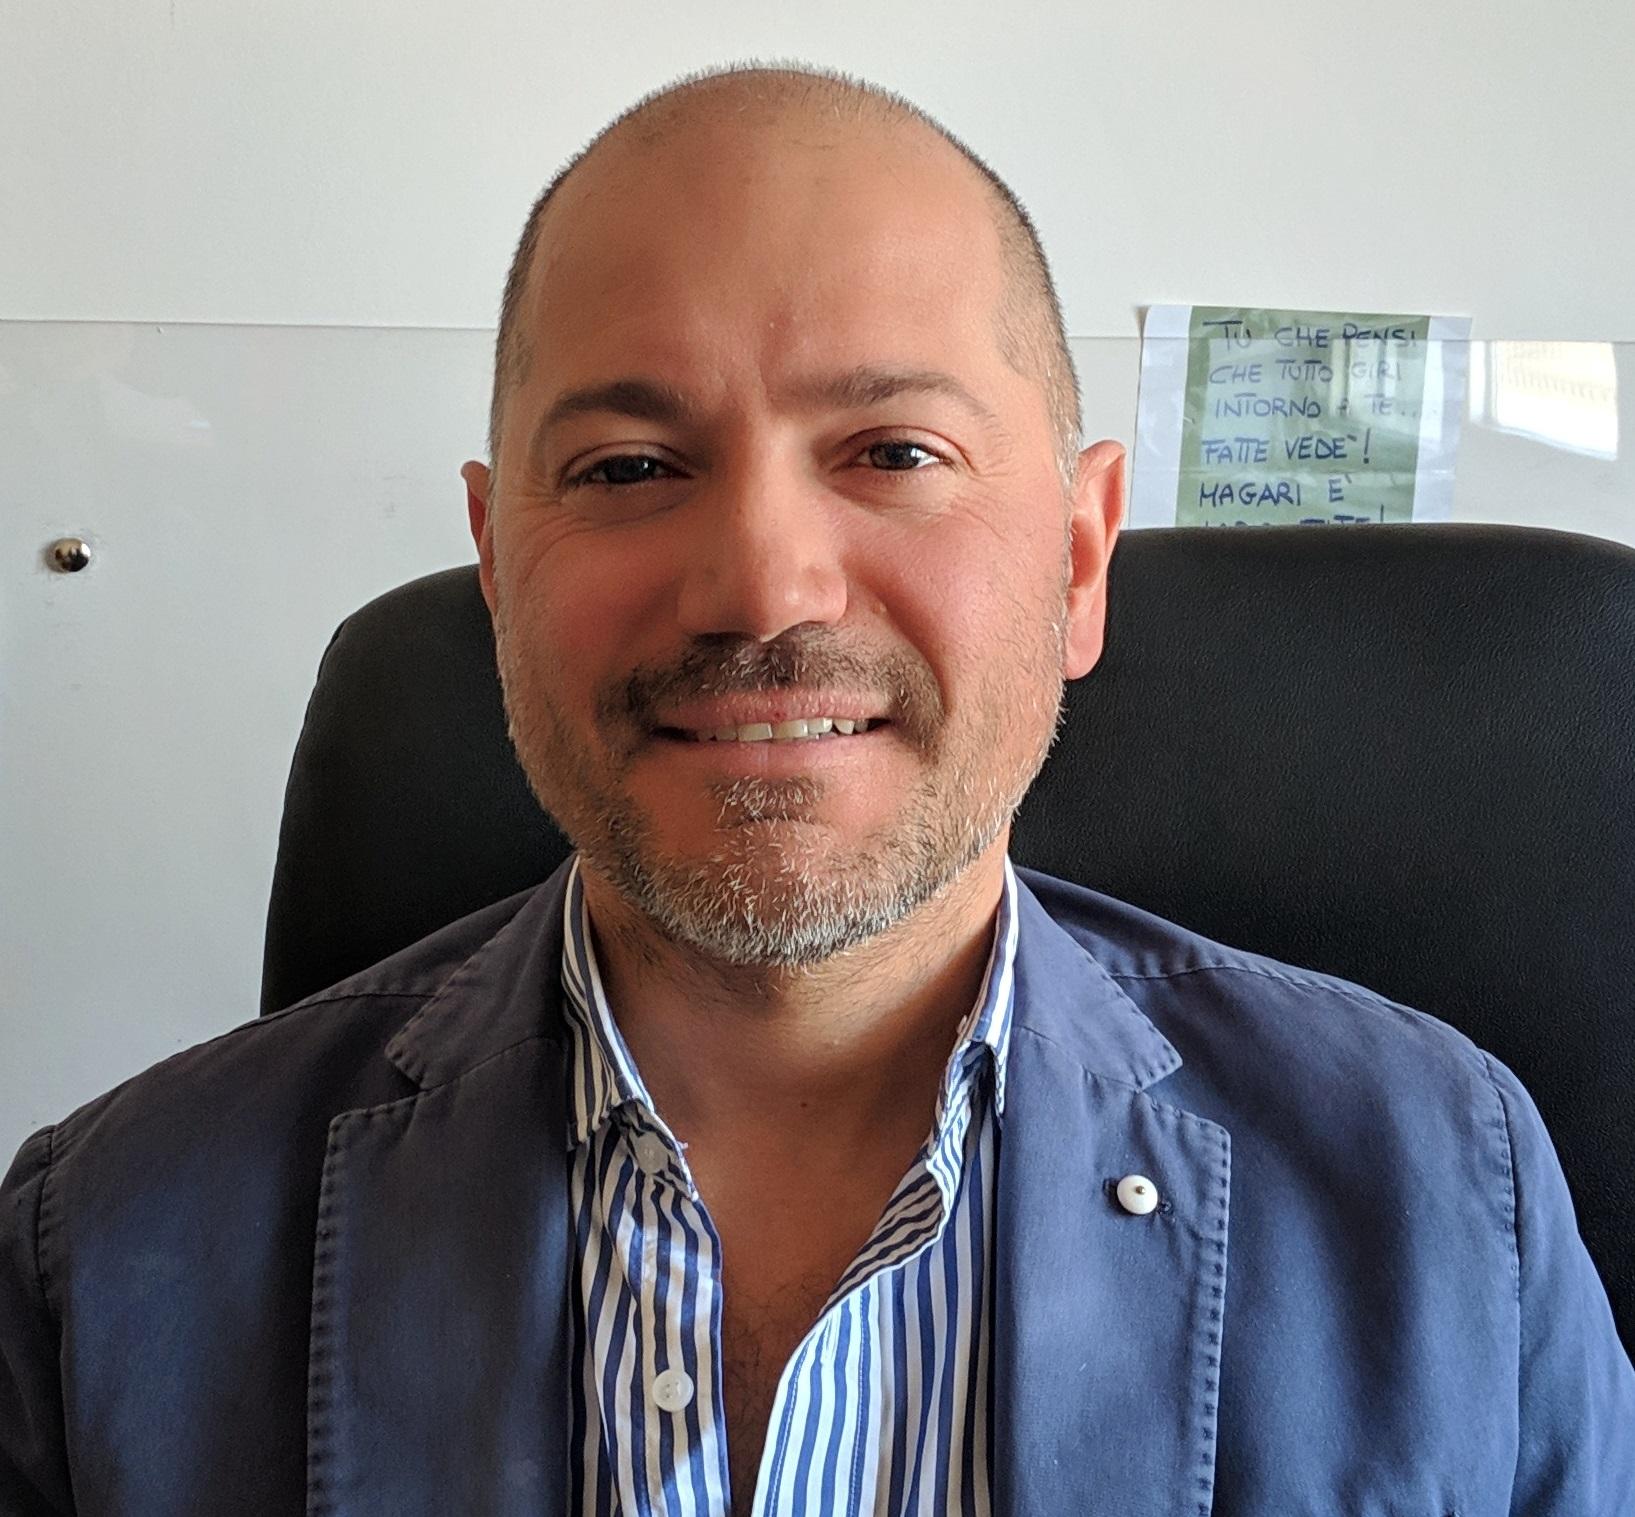 Antonio Adinolfi